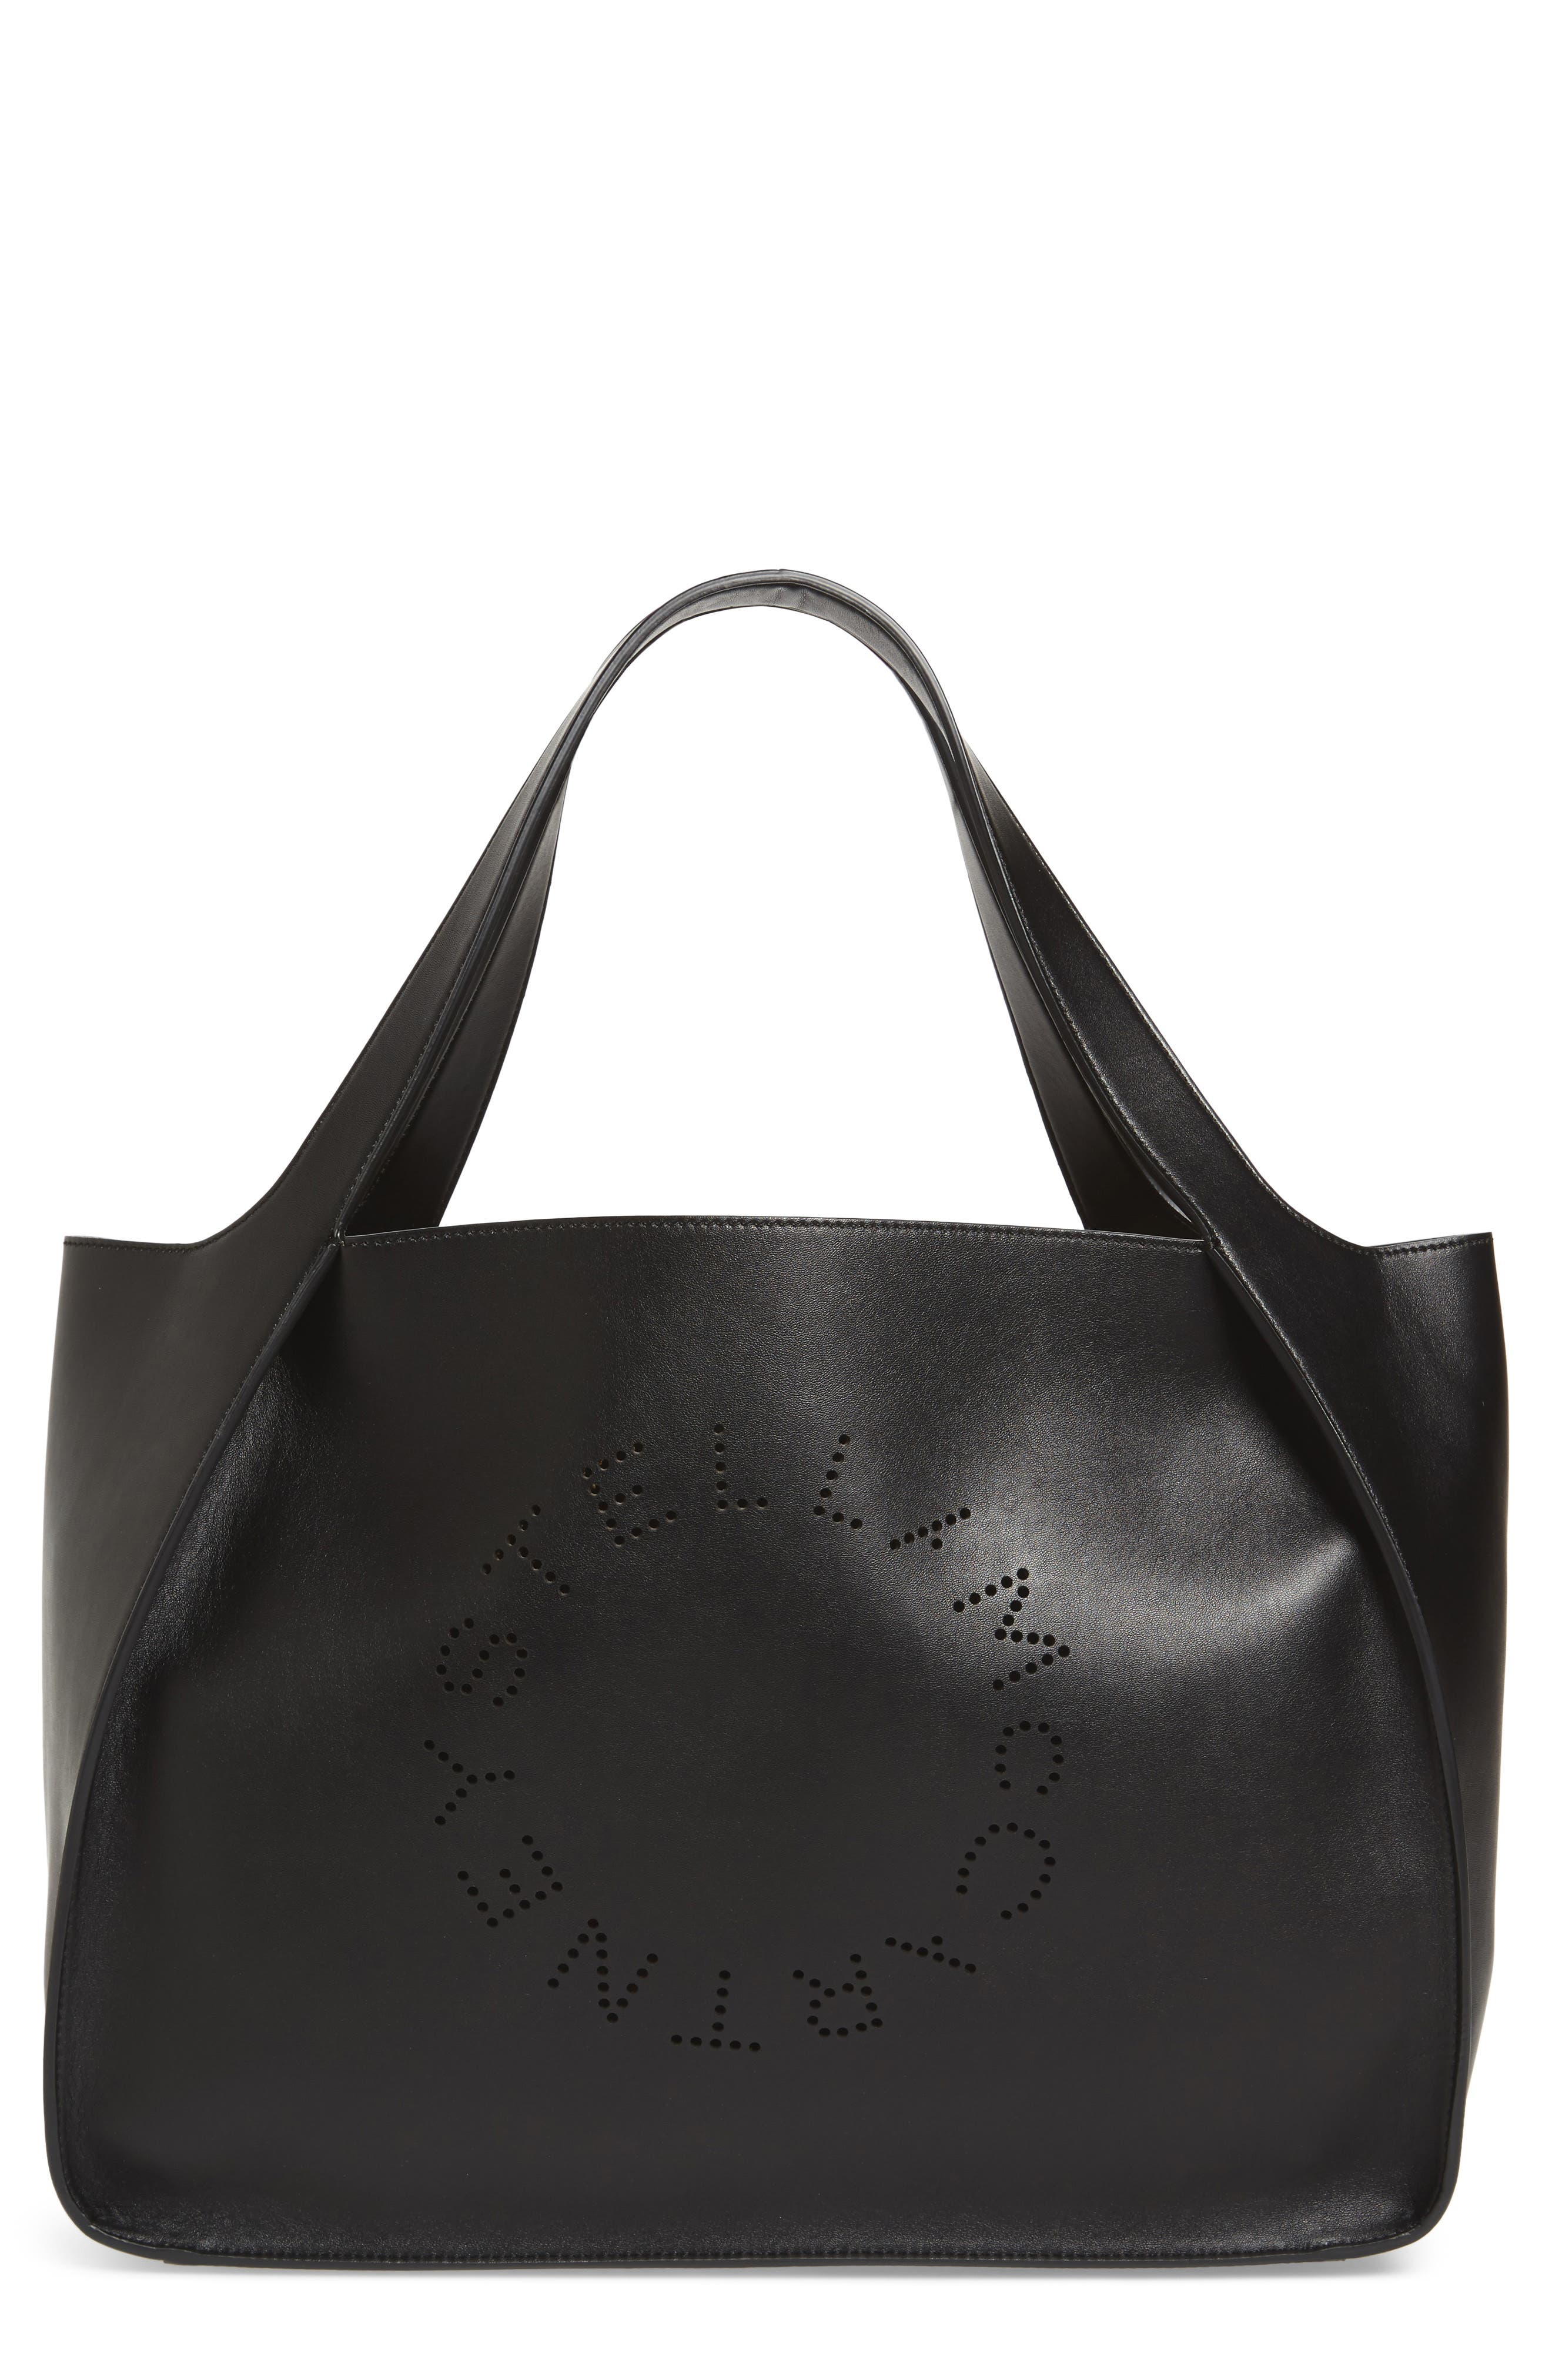 Stella McCartney Medium Perforated Logo Faux Leather Tote